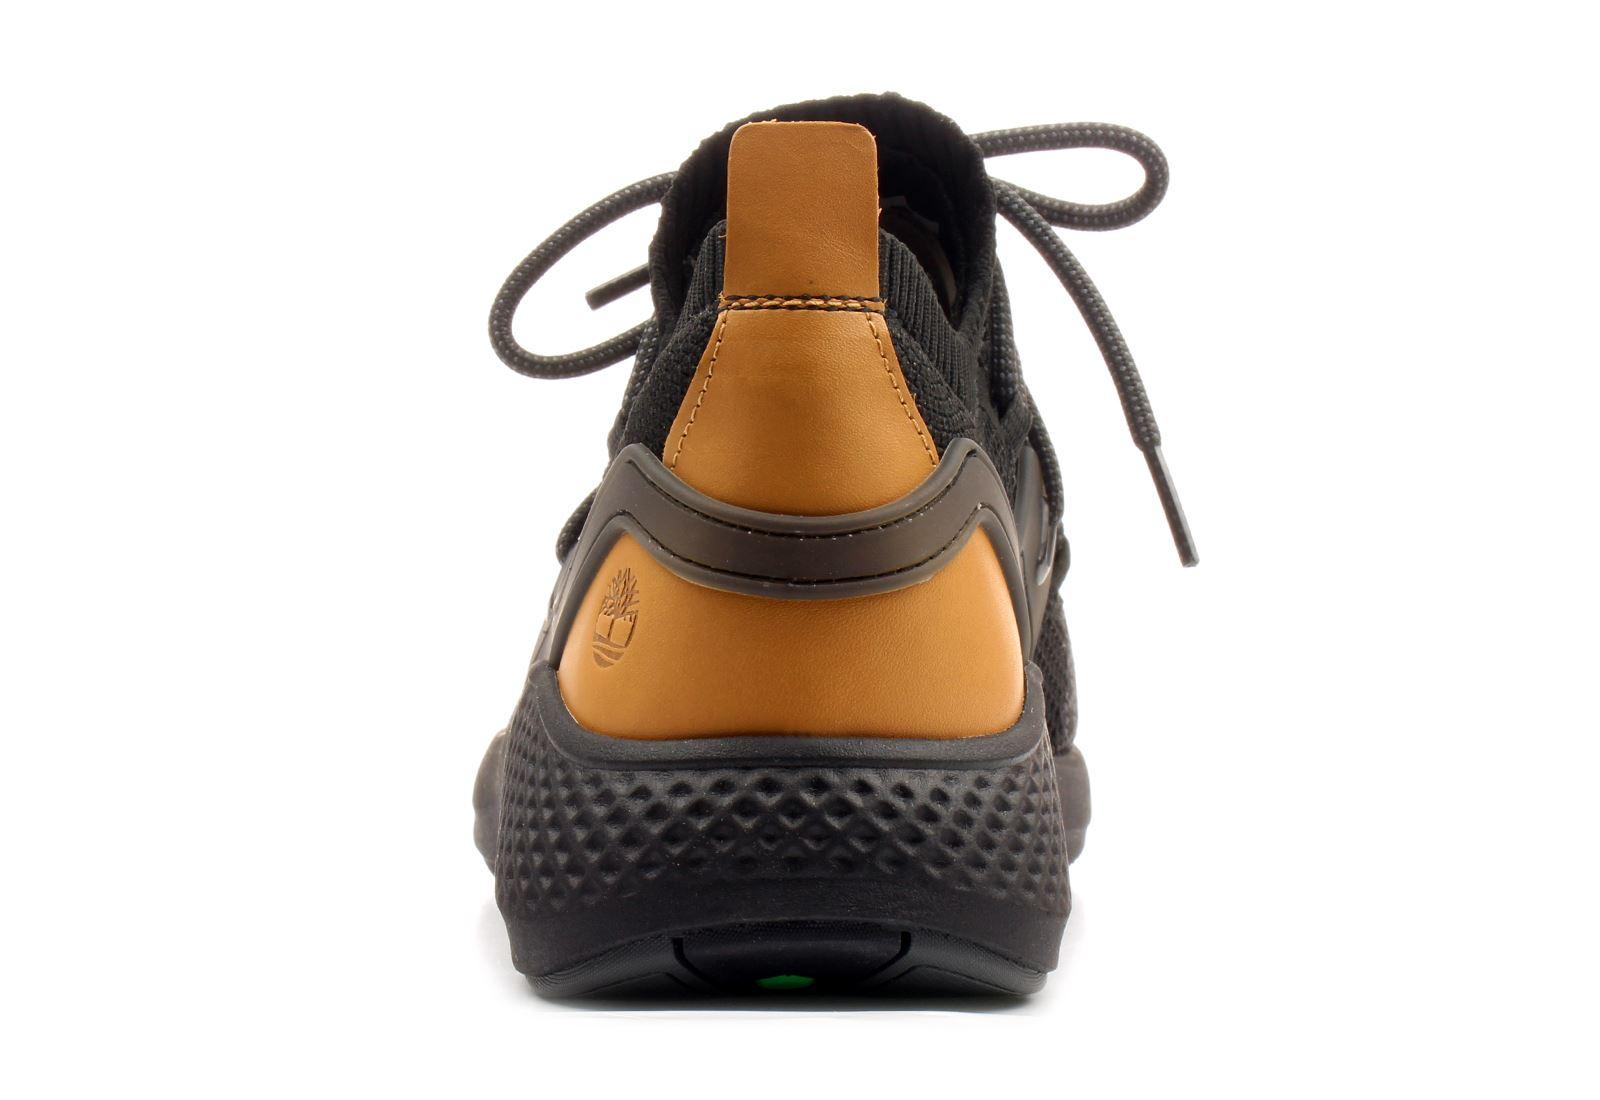 TIMBERLAND Men's boot NWT